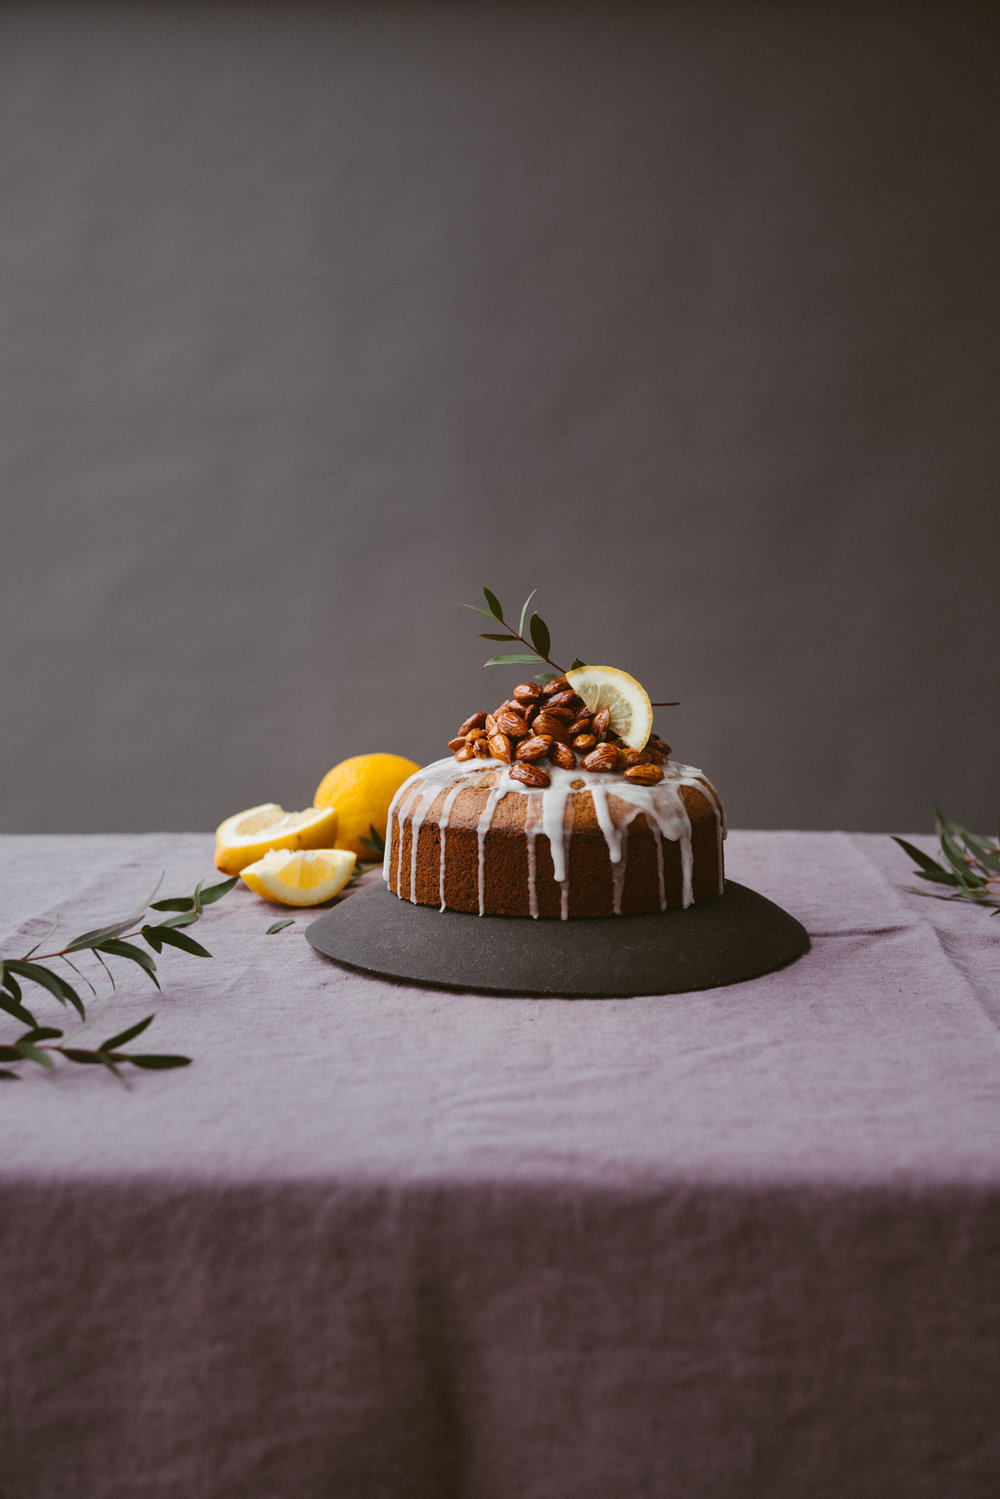 dairy_free_lemon_poppyseed_cake_with_almonds-7.jpg